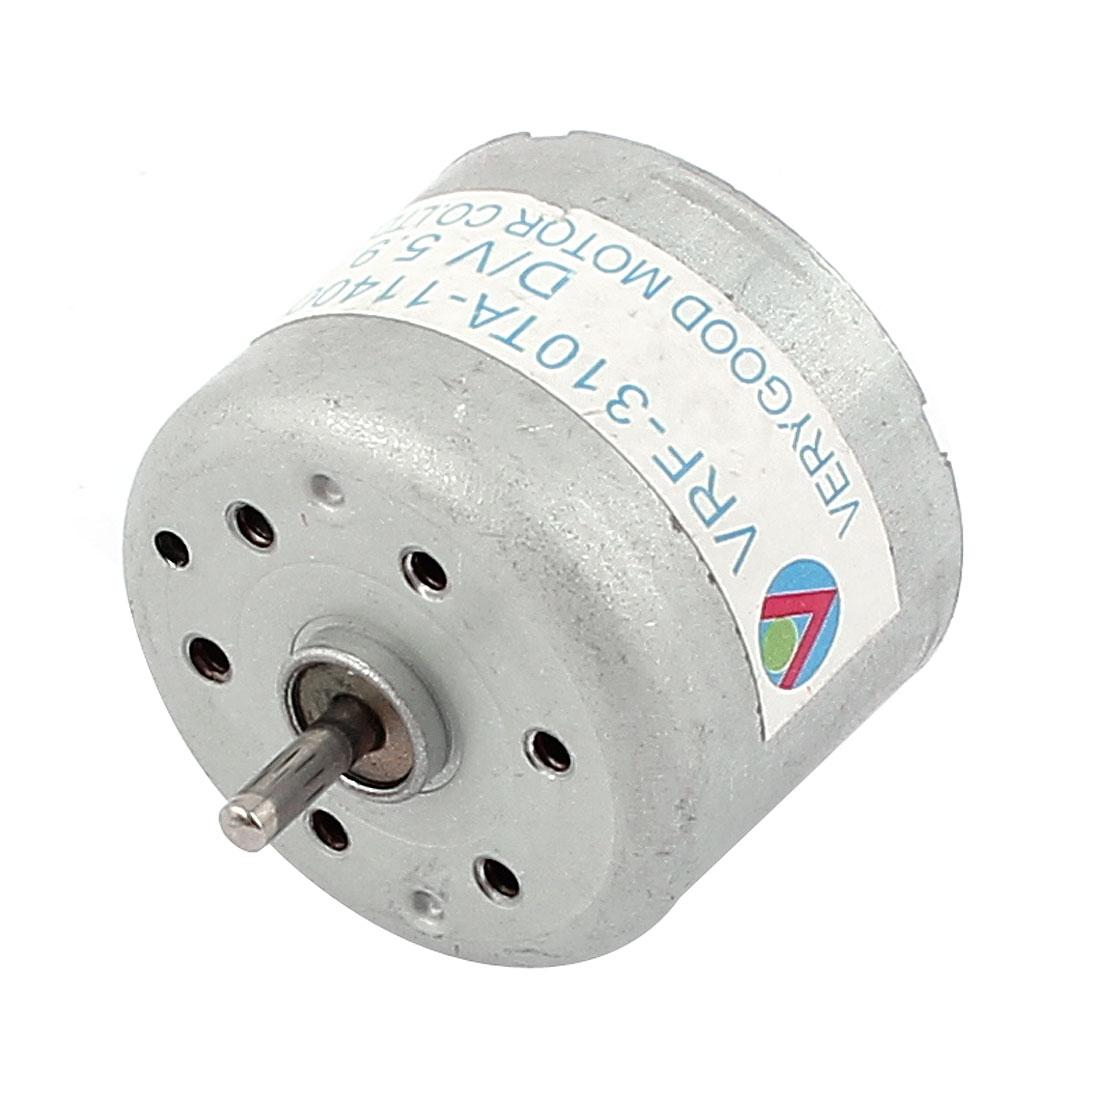 DC 3-6V 1500RPM Rotary Speed High Torque Mini Motor for Car Audio